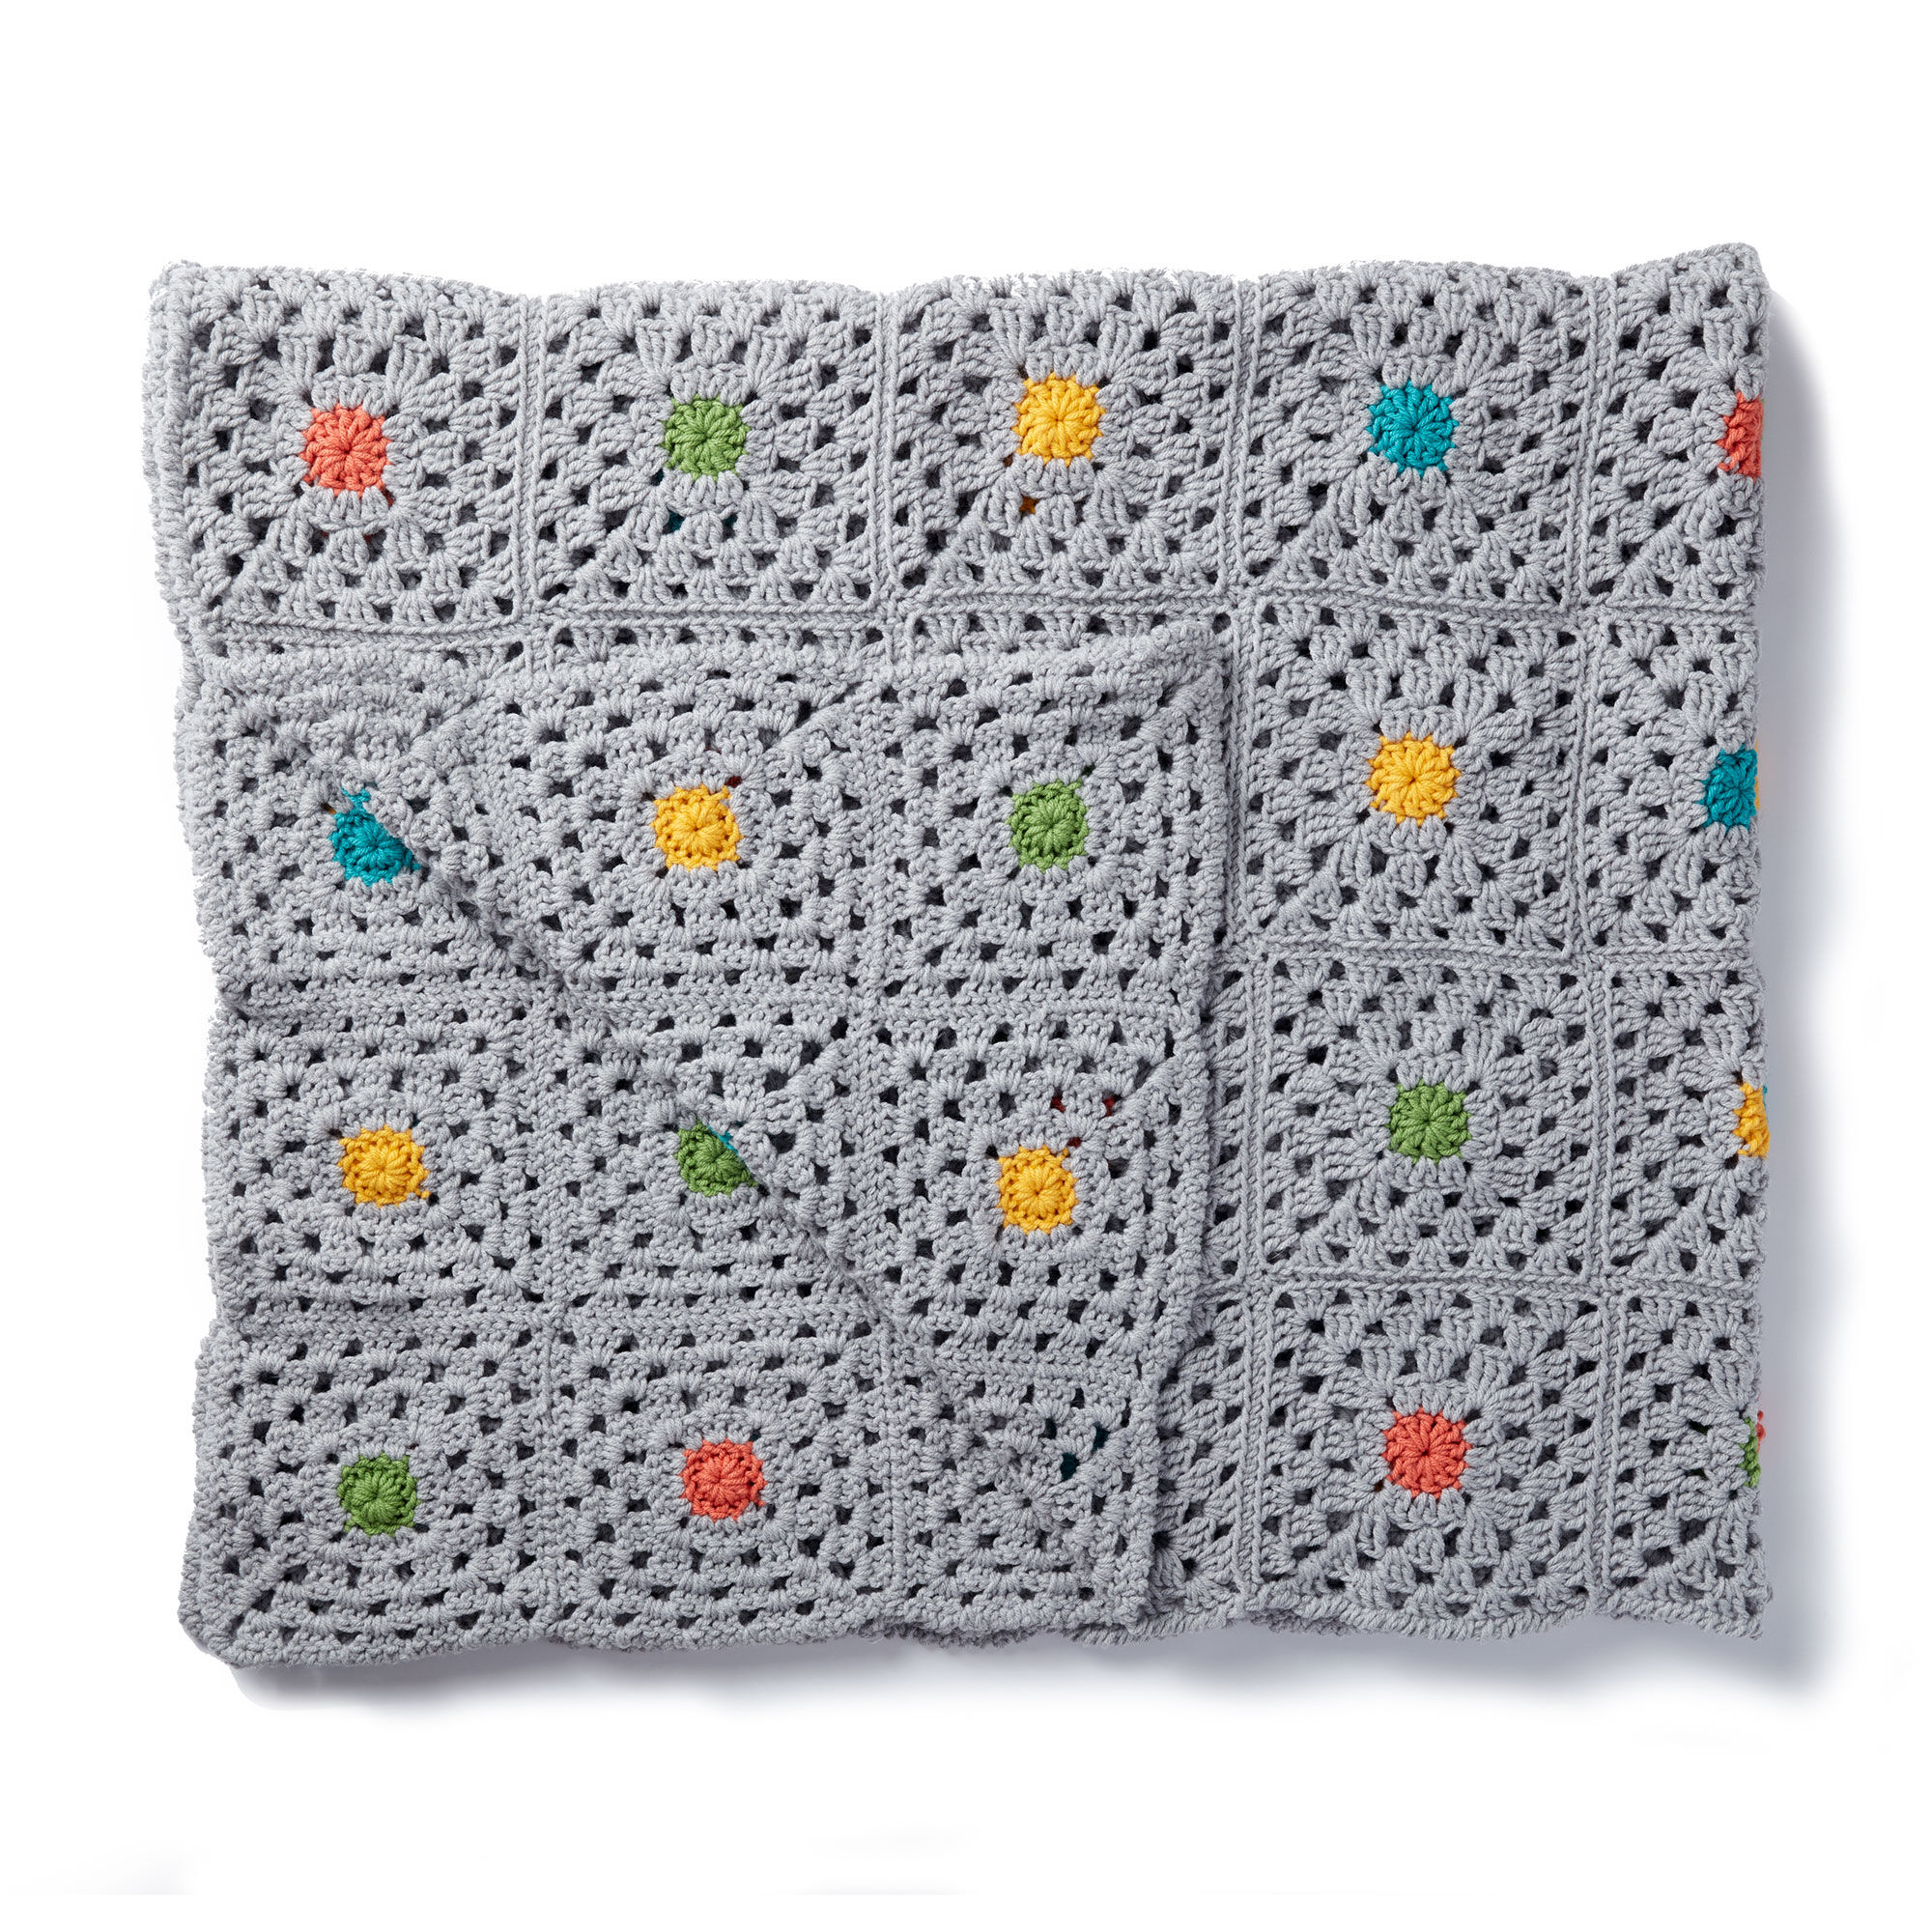 Caron Pin Point Crochet Blanket | Yarnspirations